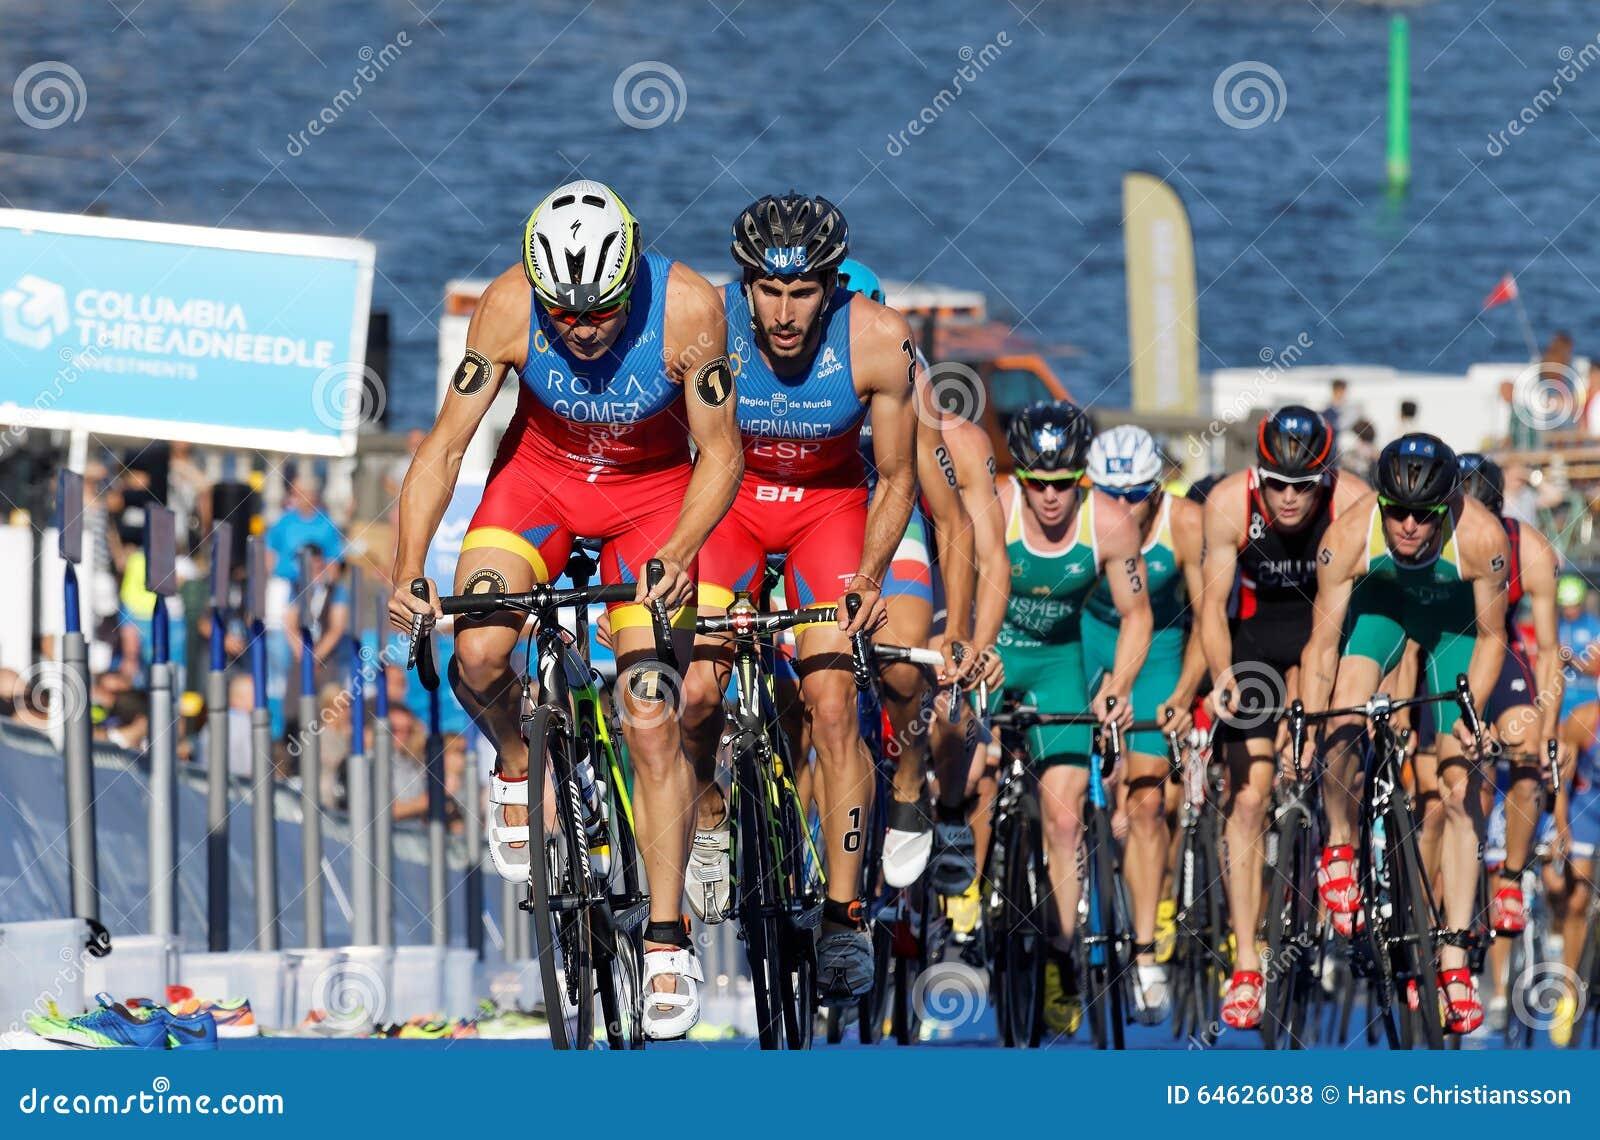 Spanish Triathlon Competitors Cycling Uphill Editorial ...